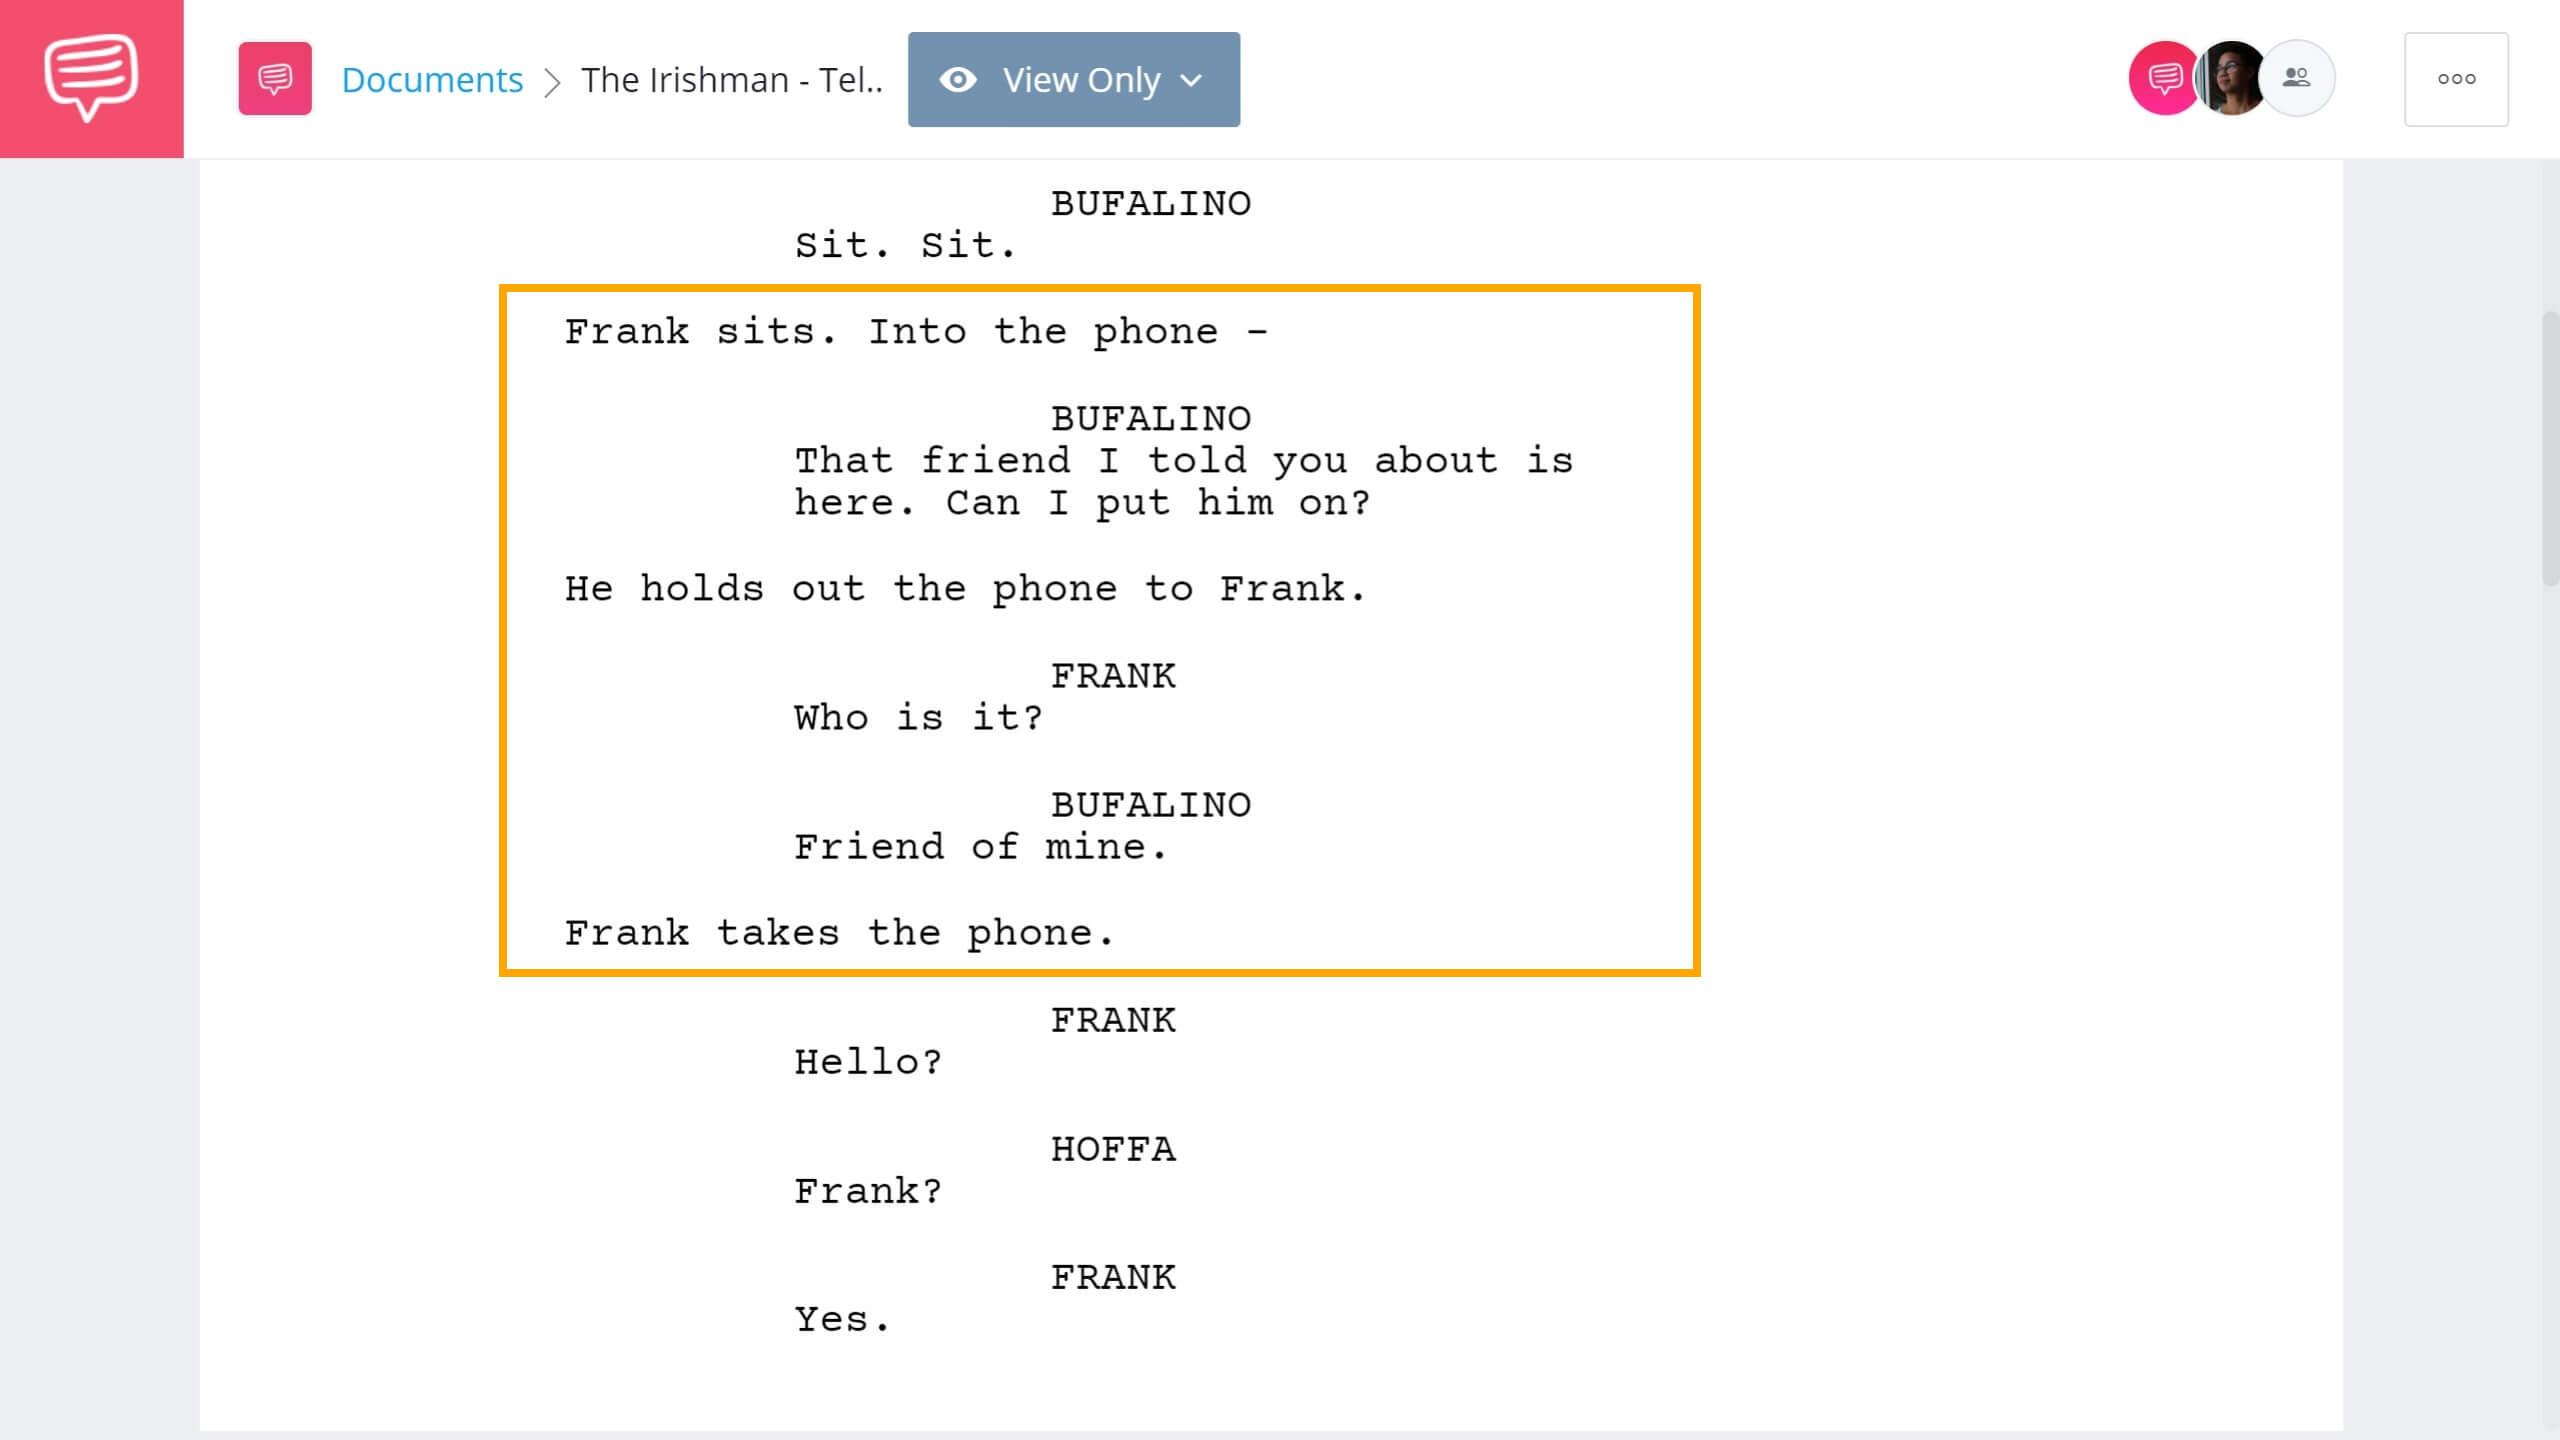 How to Write Telephone Conversation in Screenplay - The Irishman Example - StudioBinder Screenwriting Software